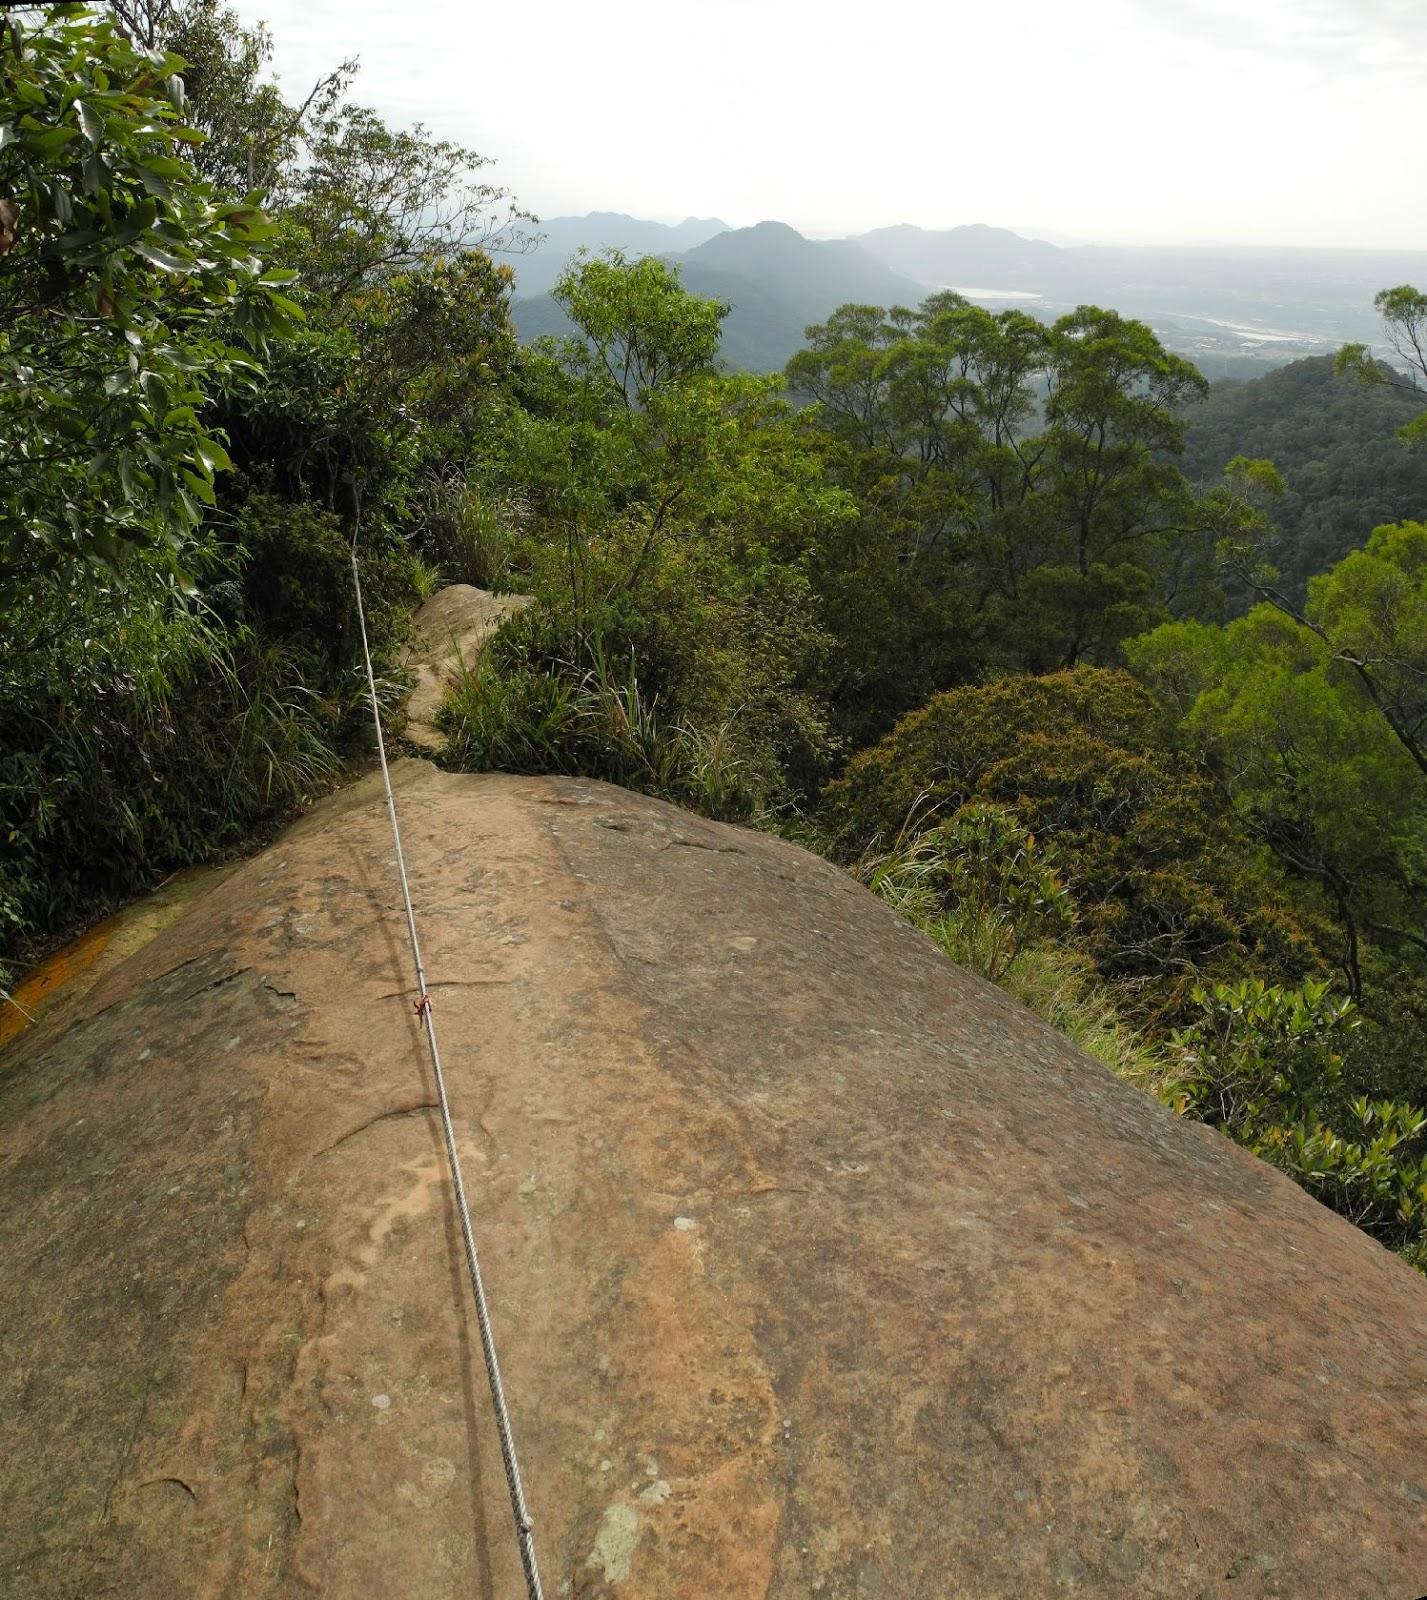 Taipei Hiker: 2012年10月18日 大溪金面山-白石山縱走 打鐵寮古道を下る